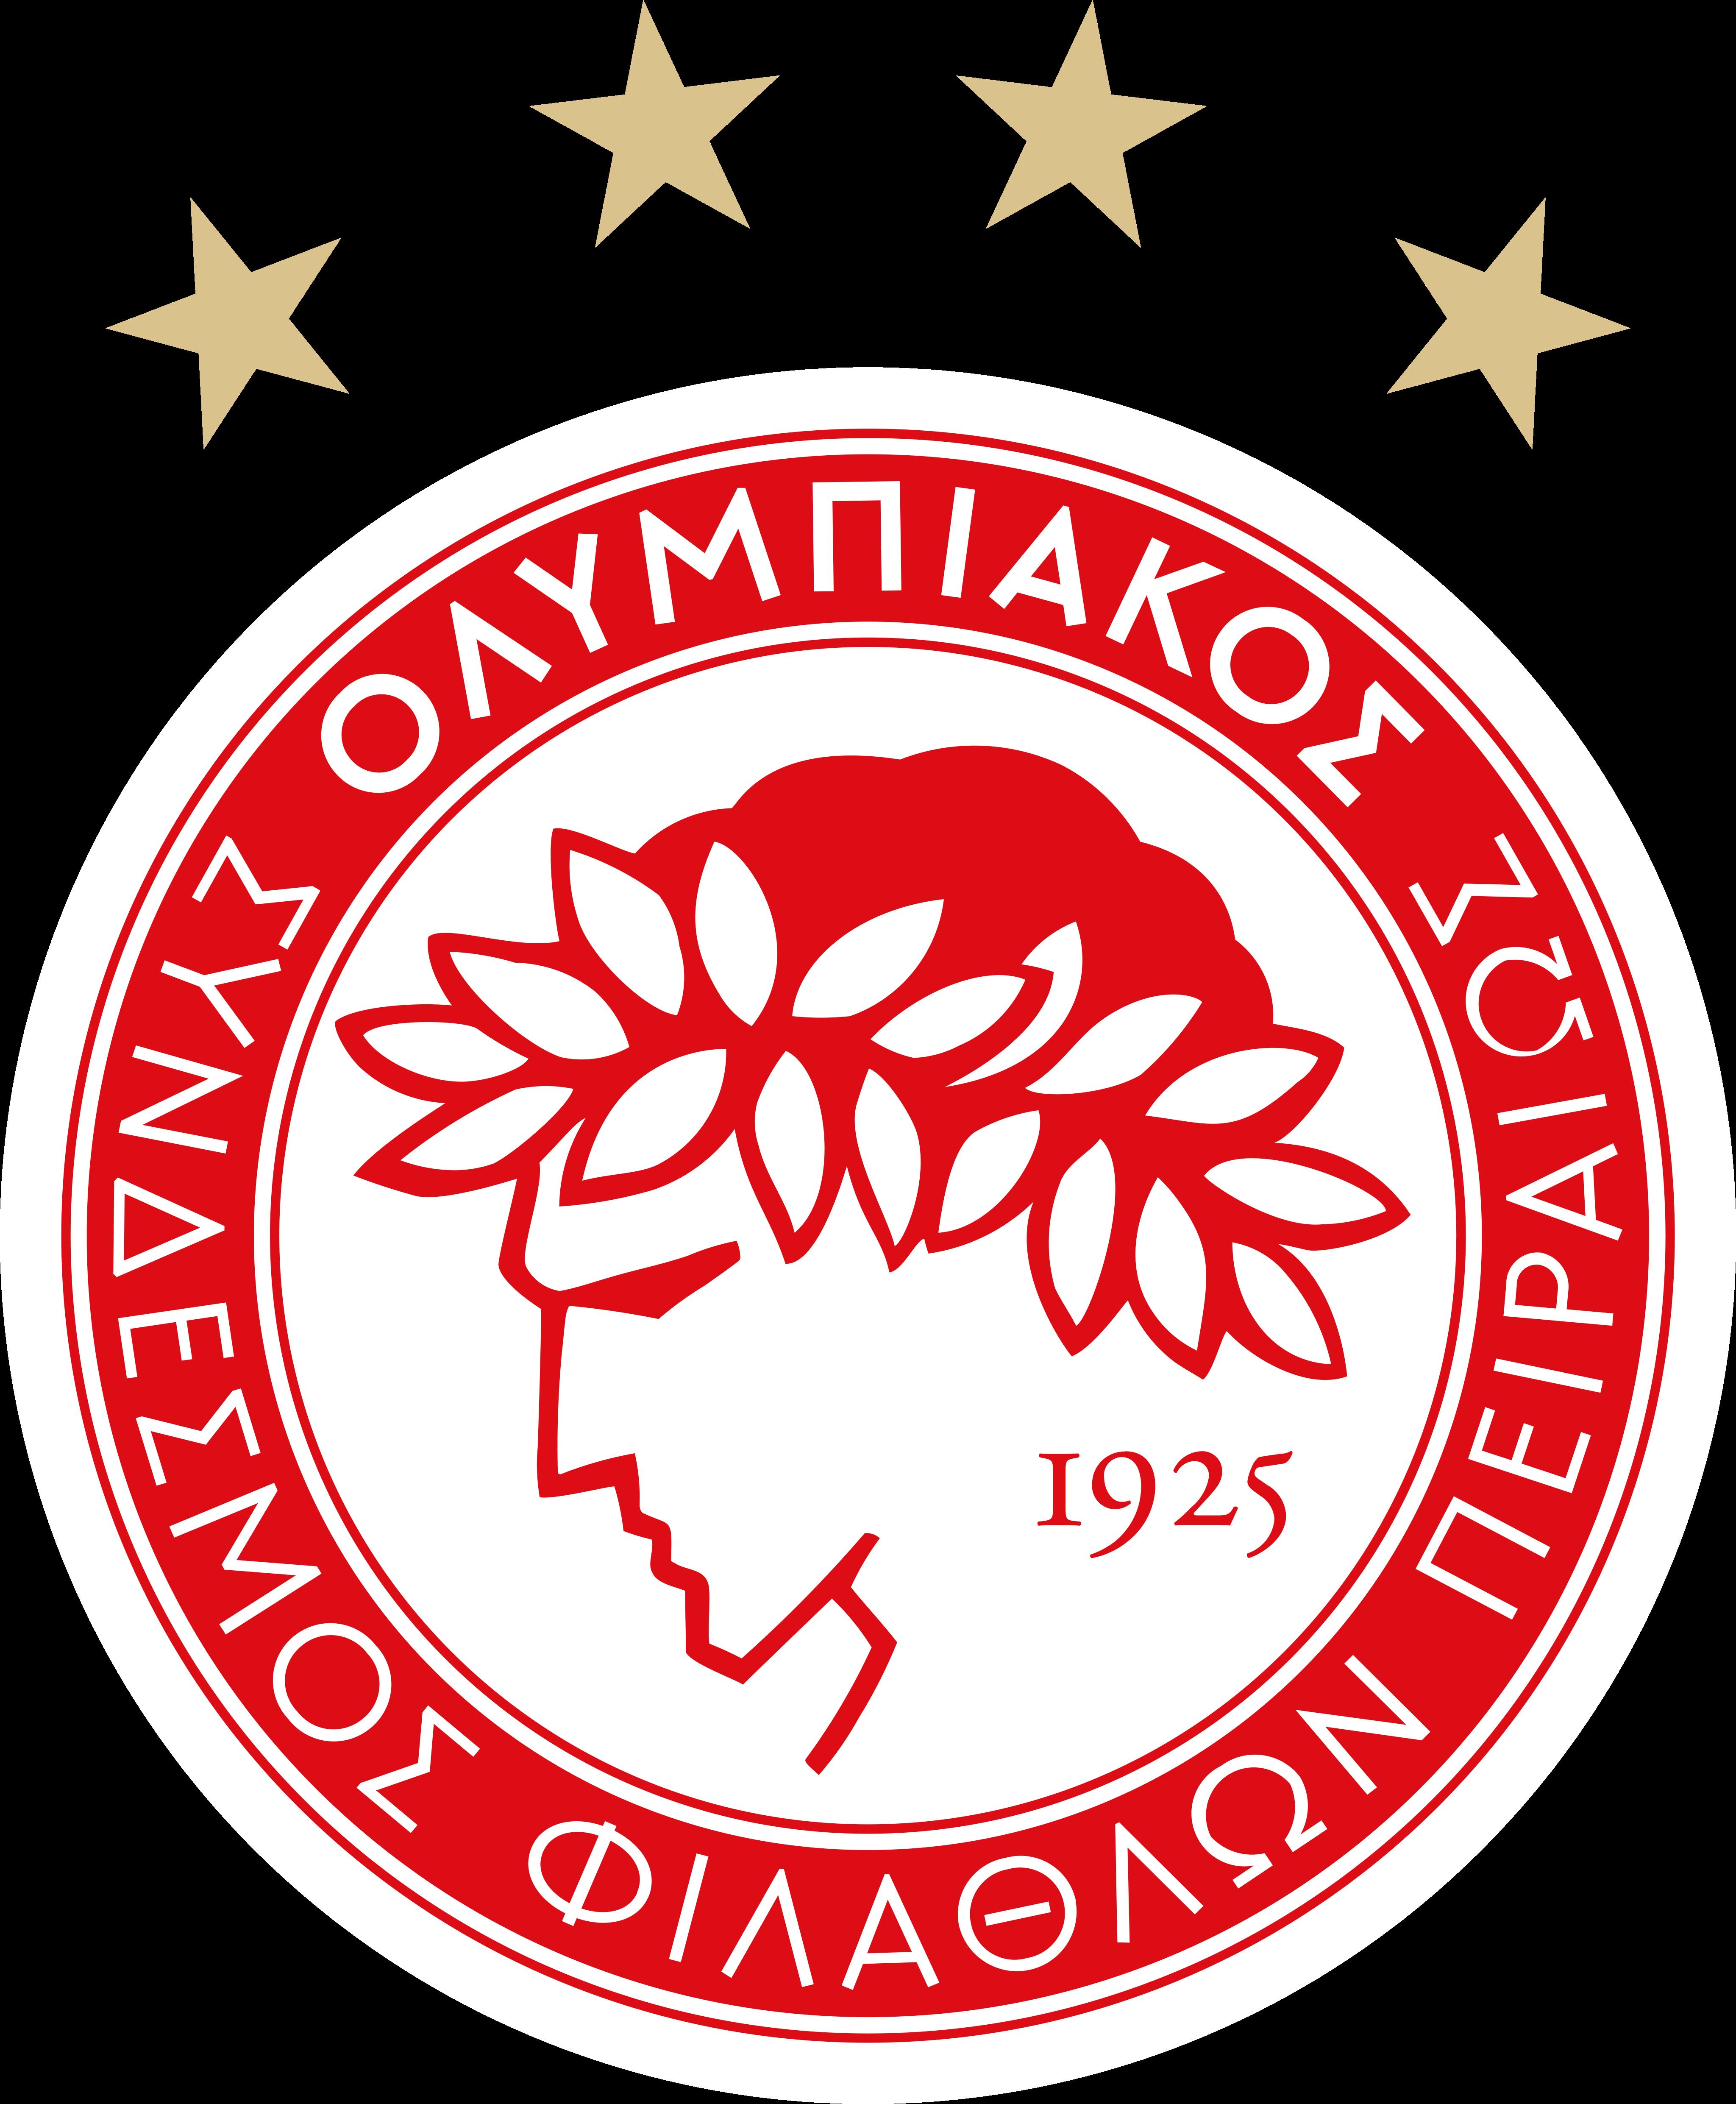 olympiacos logo - Olympiacos Logo - Escudo